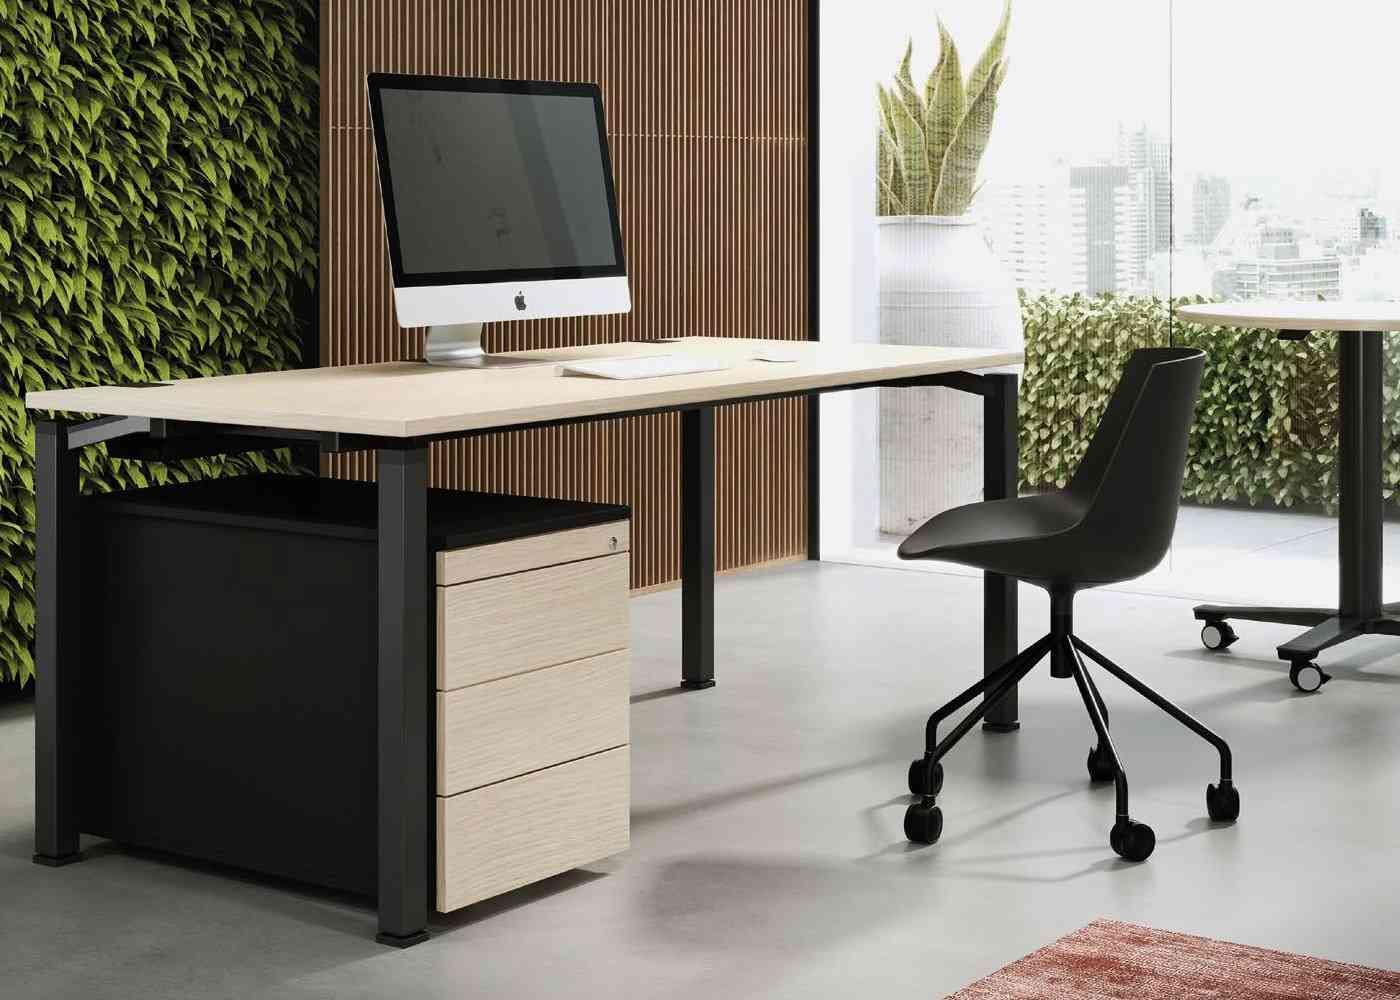 Büromöbel R50/Q50